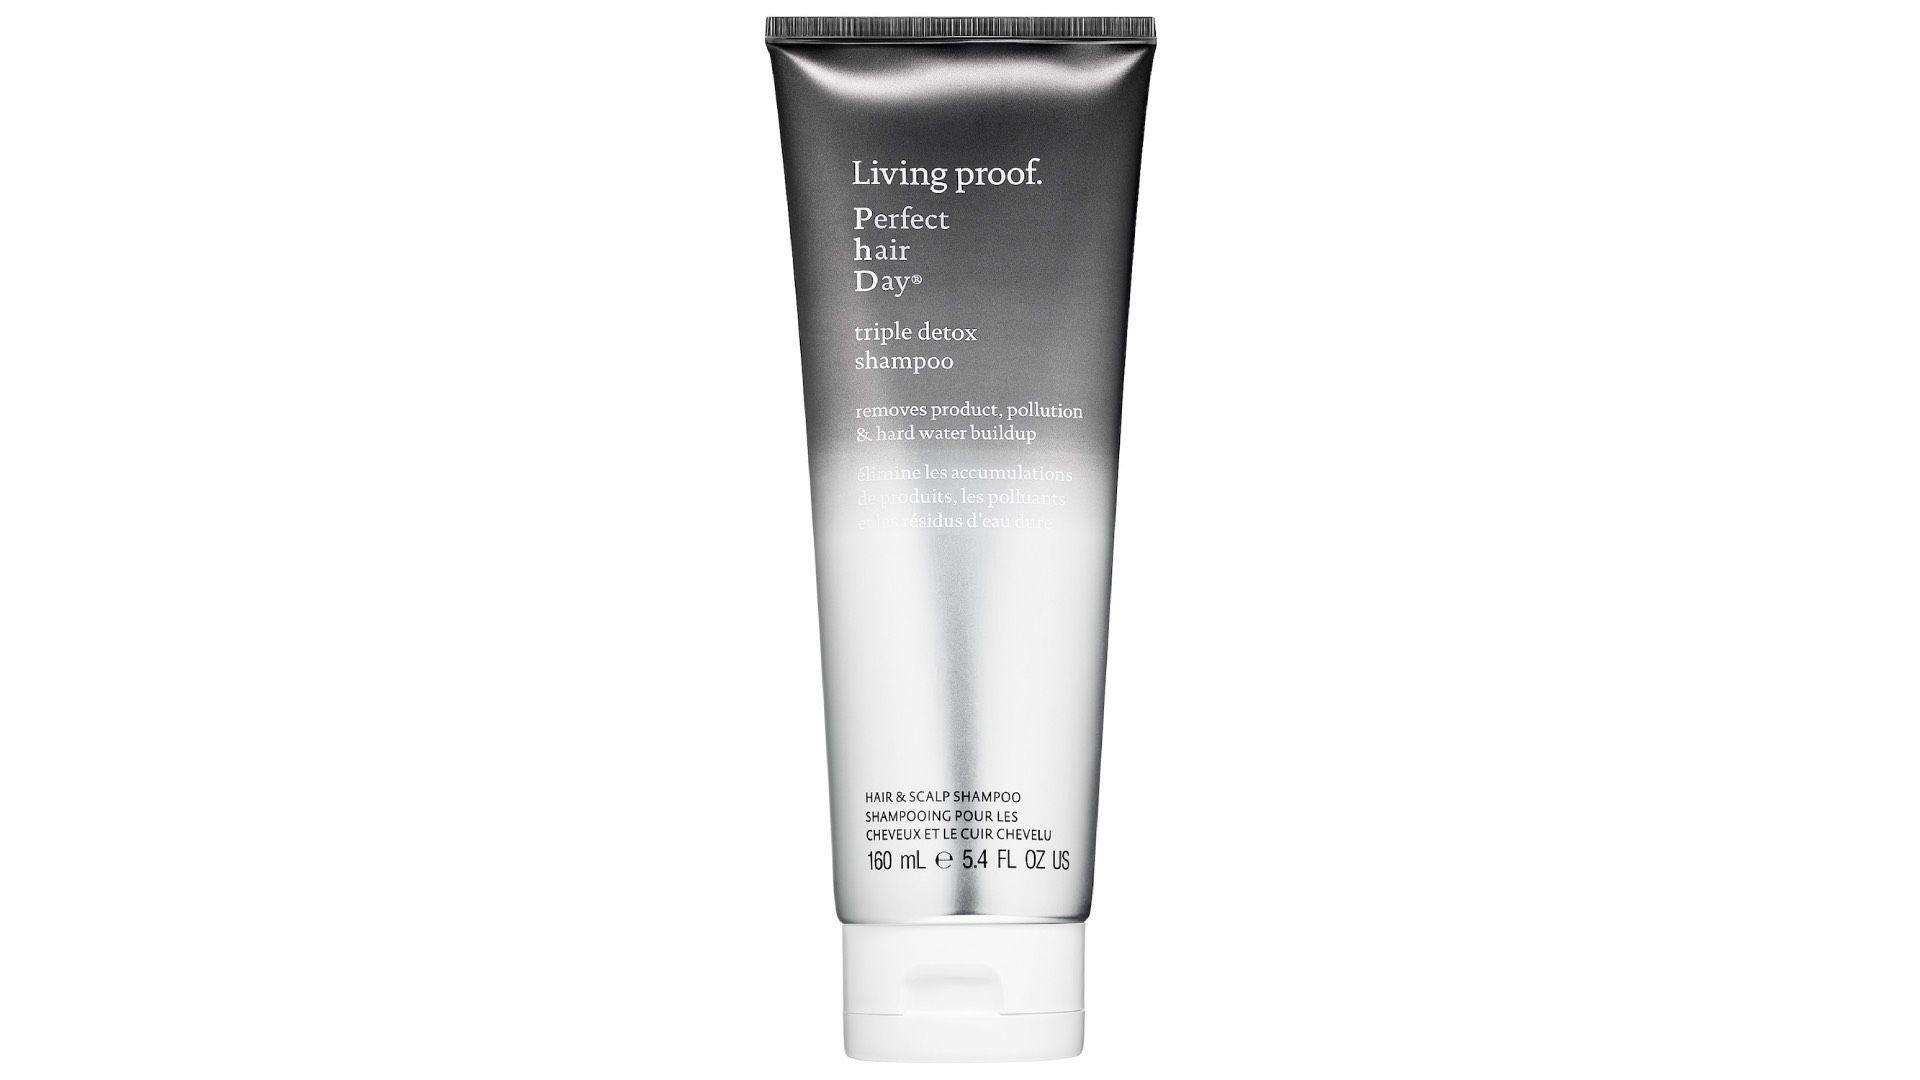 Living Proof triple detox shampoo